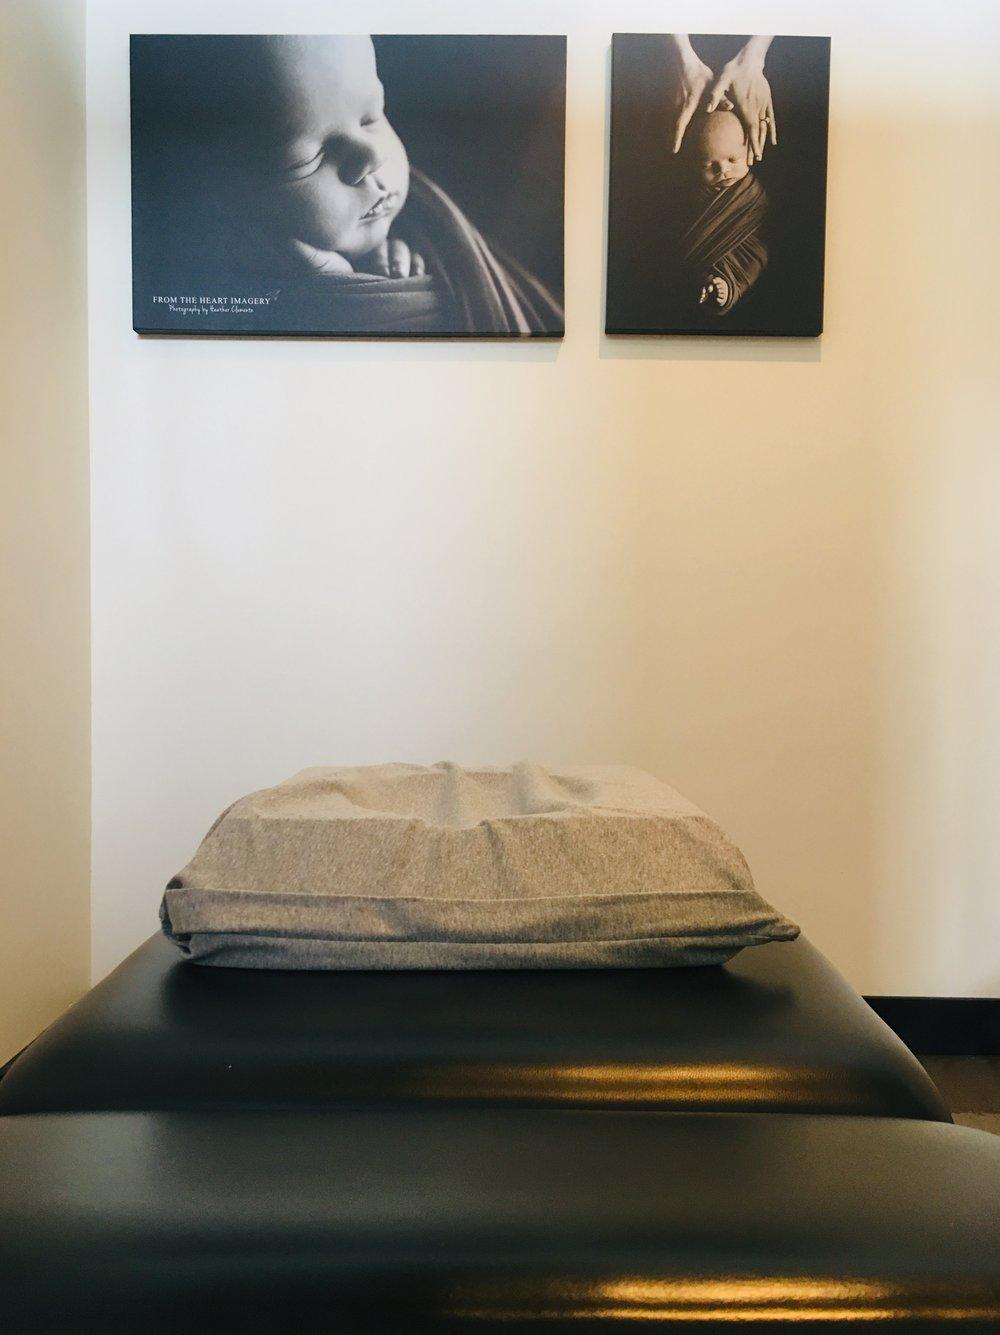 Pregnancy pillows make prenatal adjustments so comfortable!